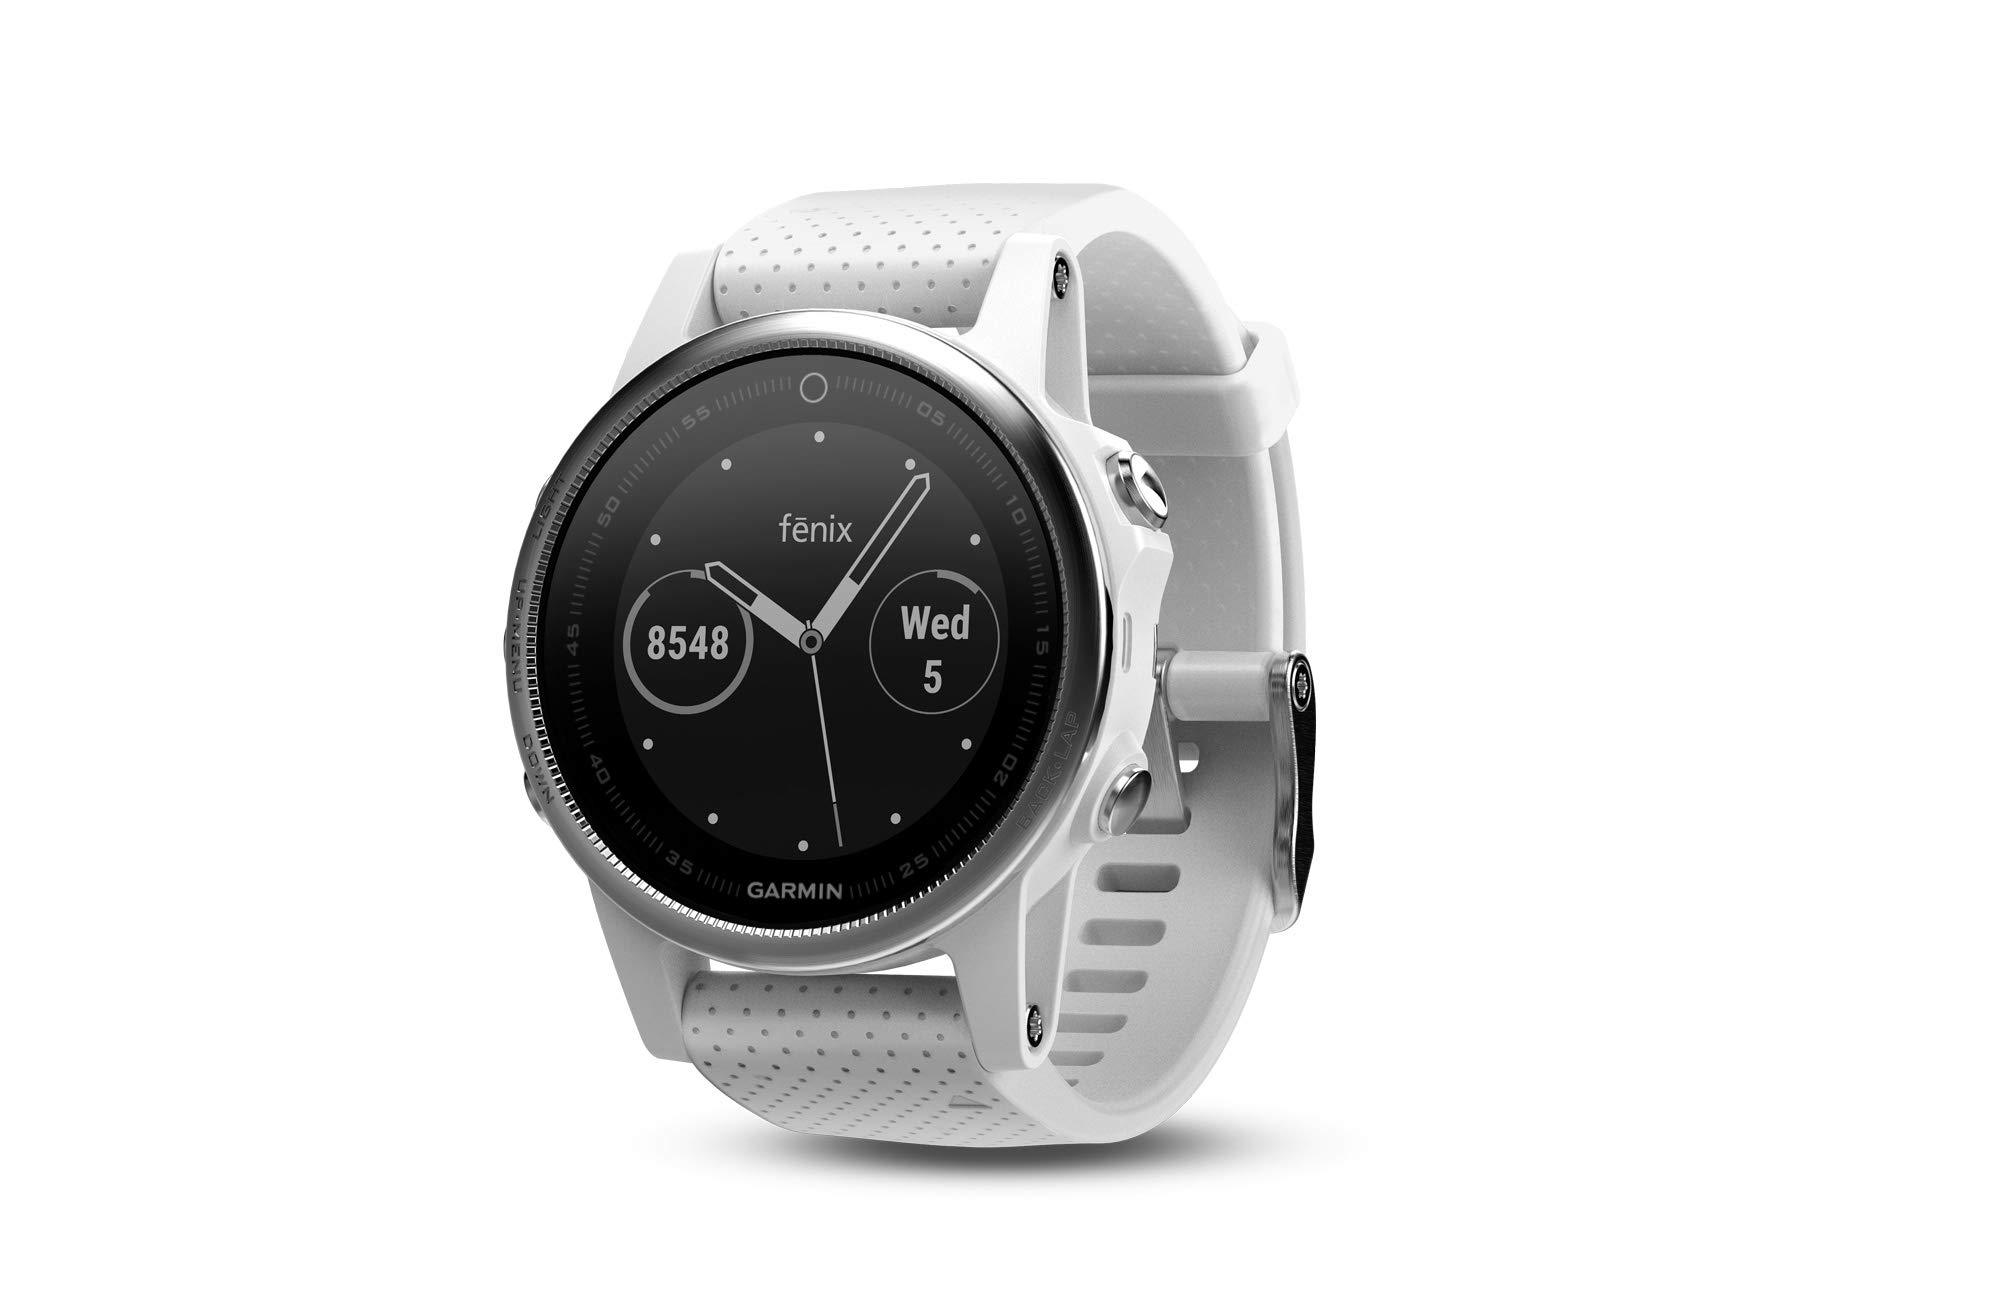 Garmin fēnix 5S, Premium and Rugged Smaller-Sized Multisport GPS Smartwatch, White, (Renewed)